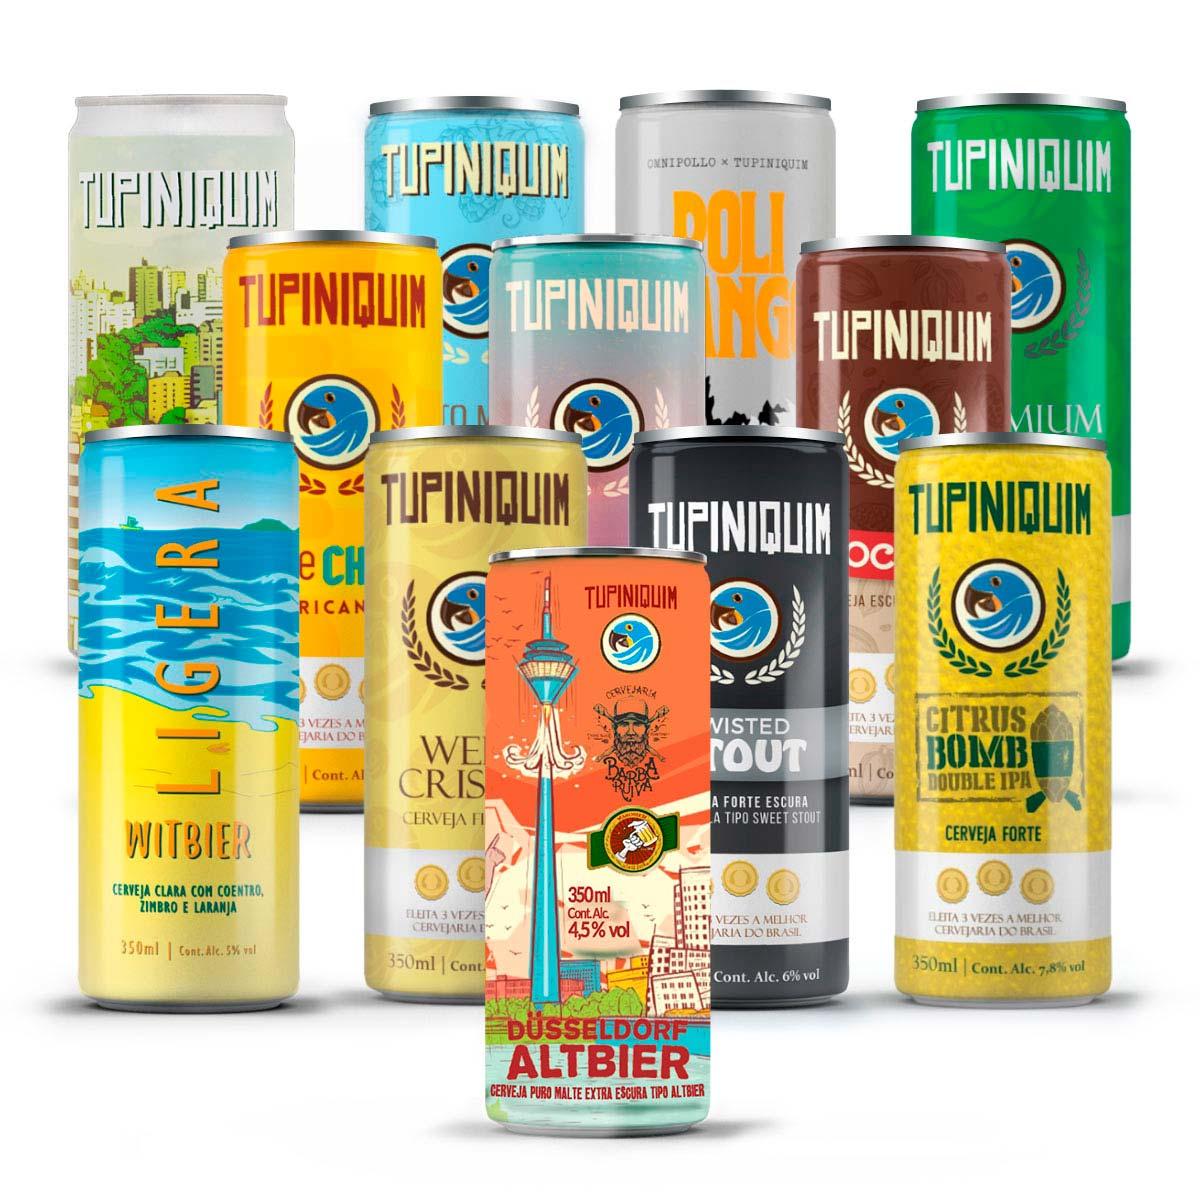 Kit degustação Tupiniquim 12 cervejas mix lata